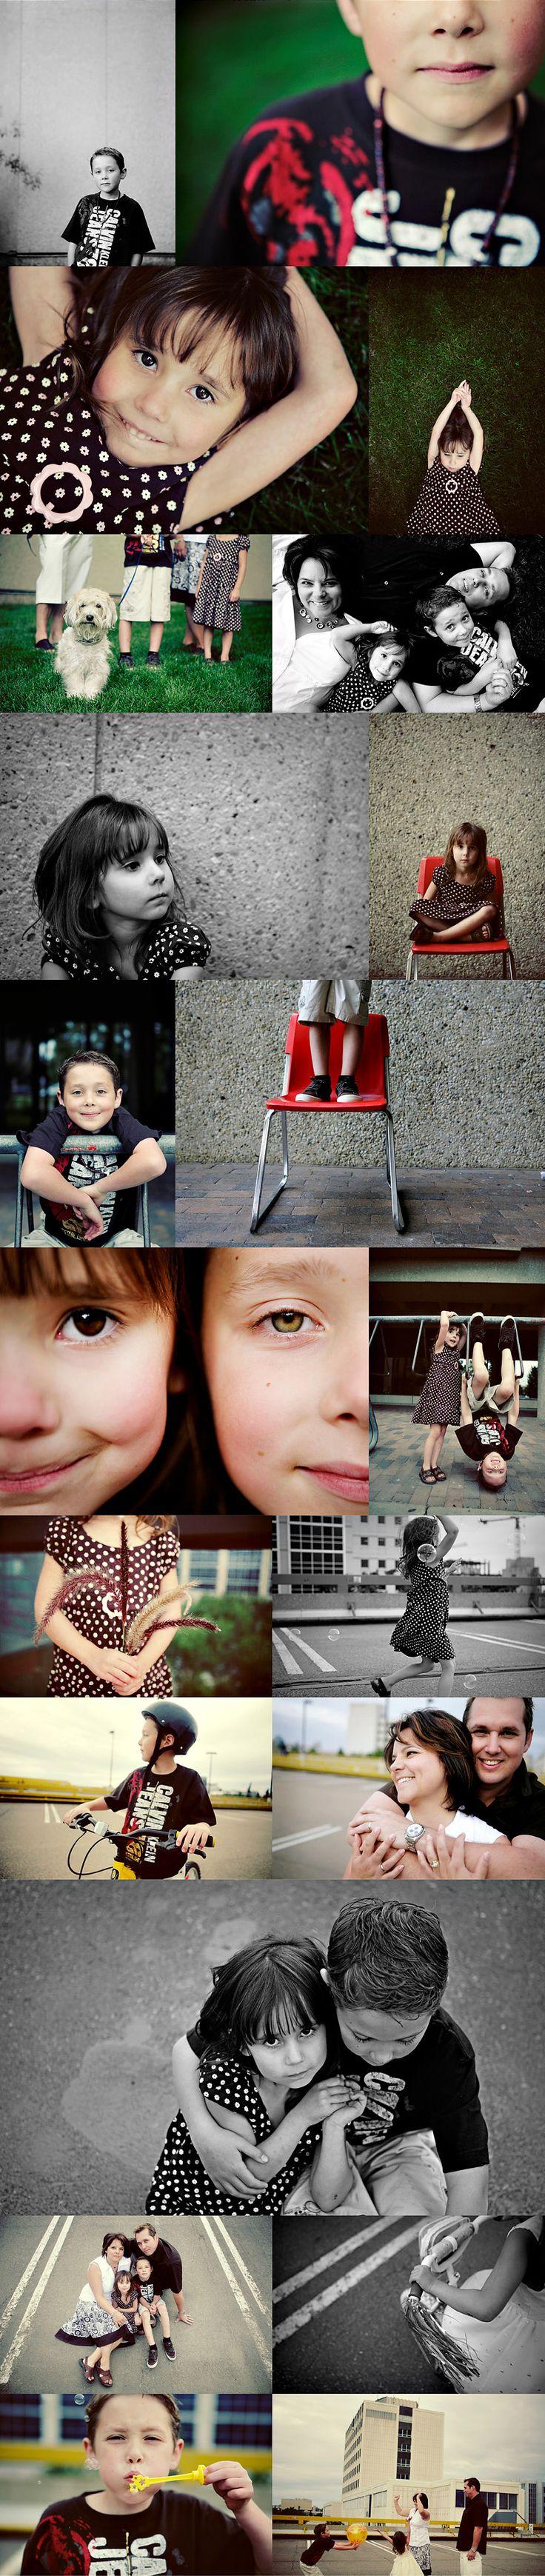 lifestyle photography pinksugar photography